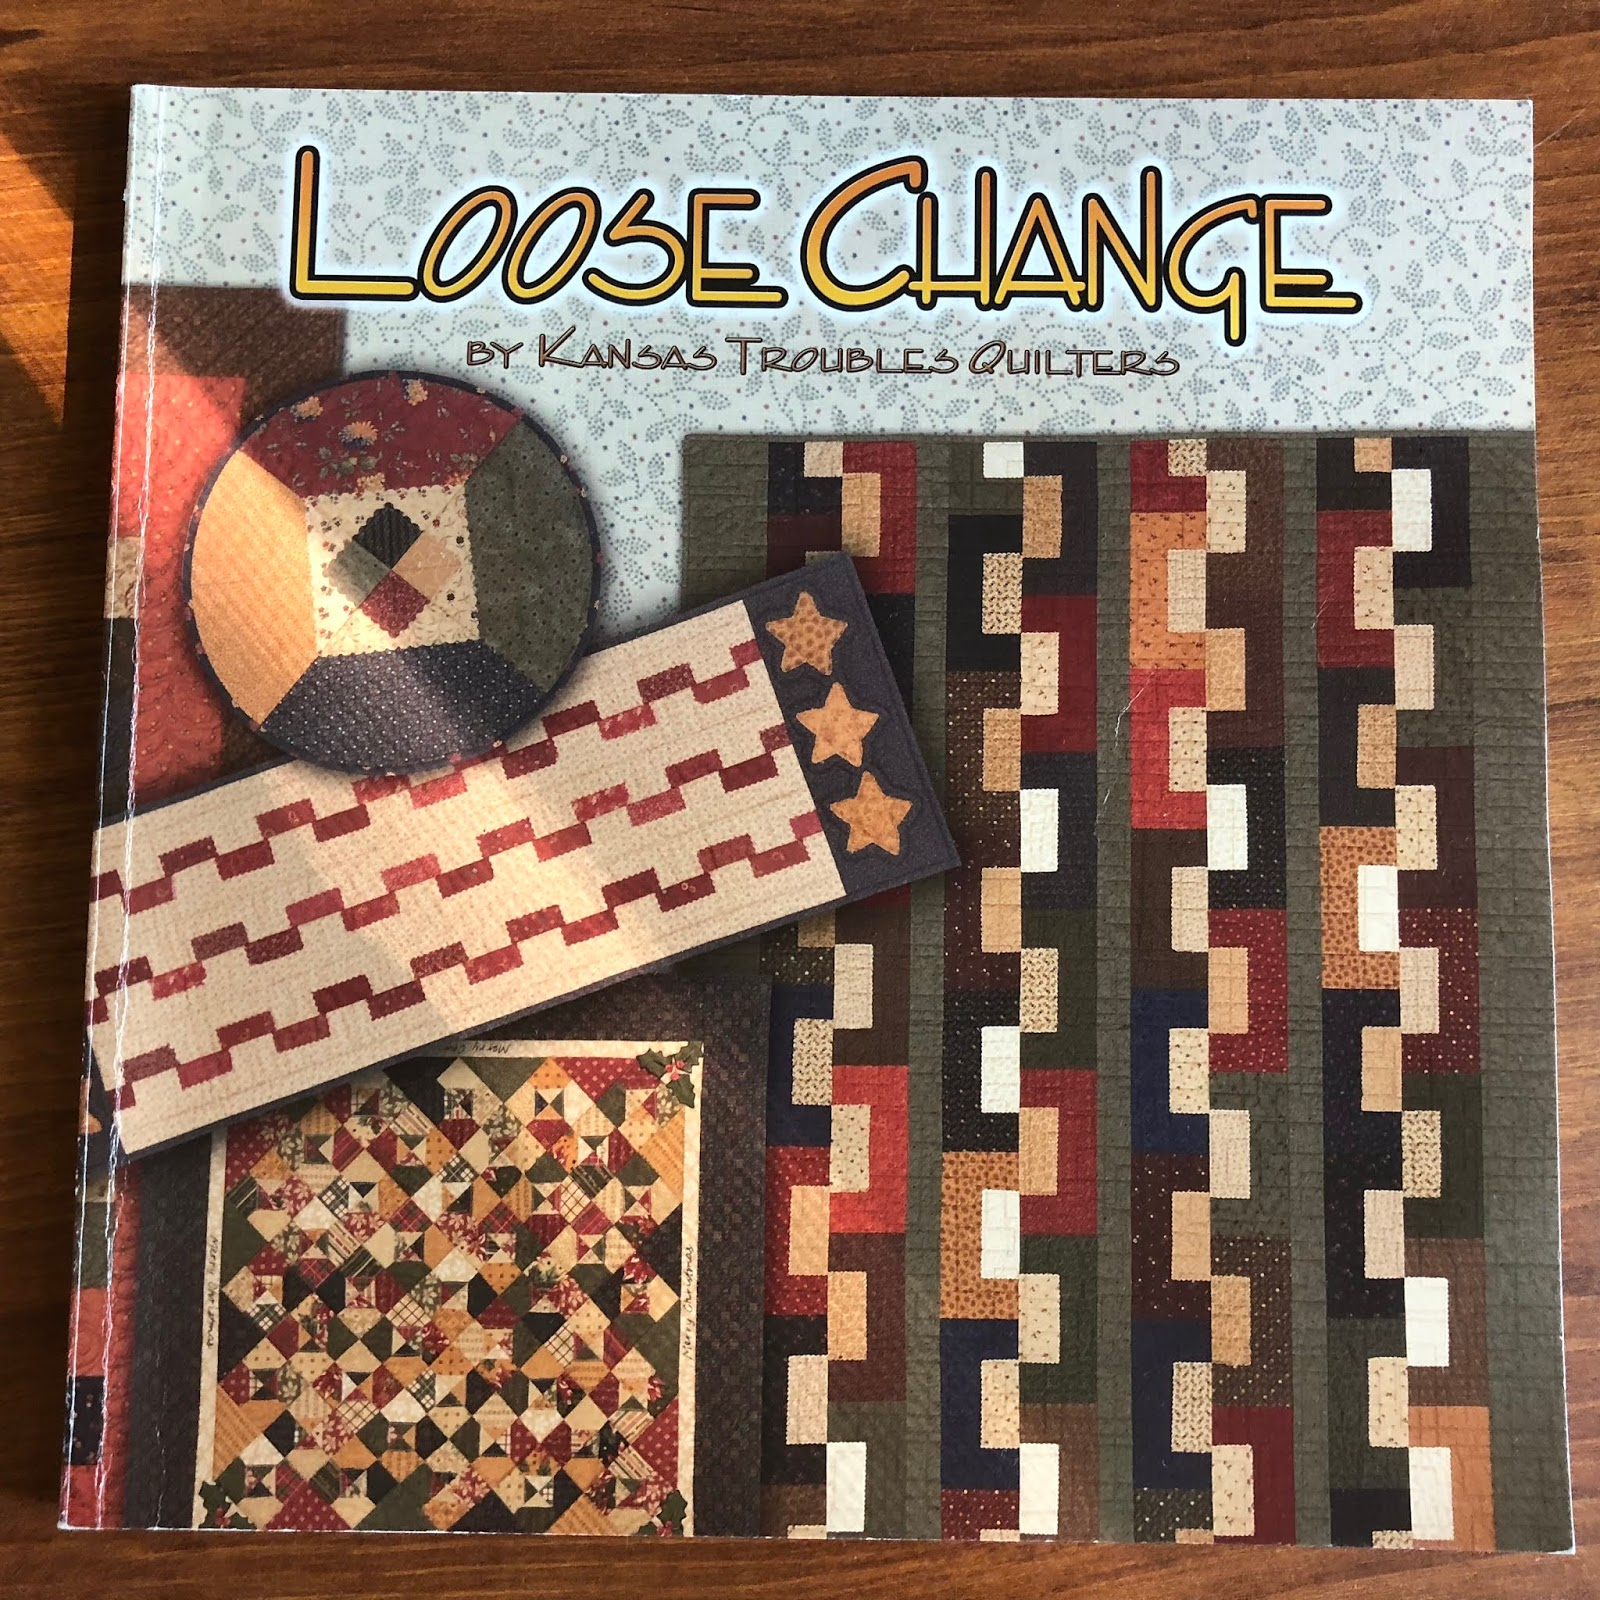 5. Cut loose change